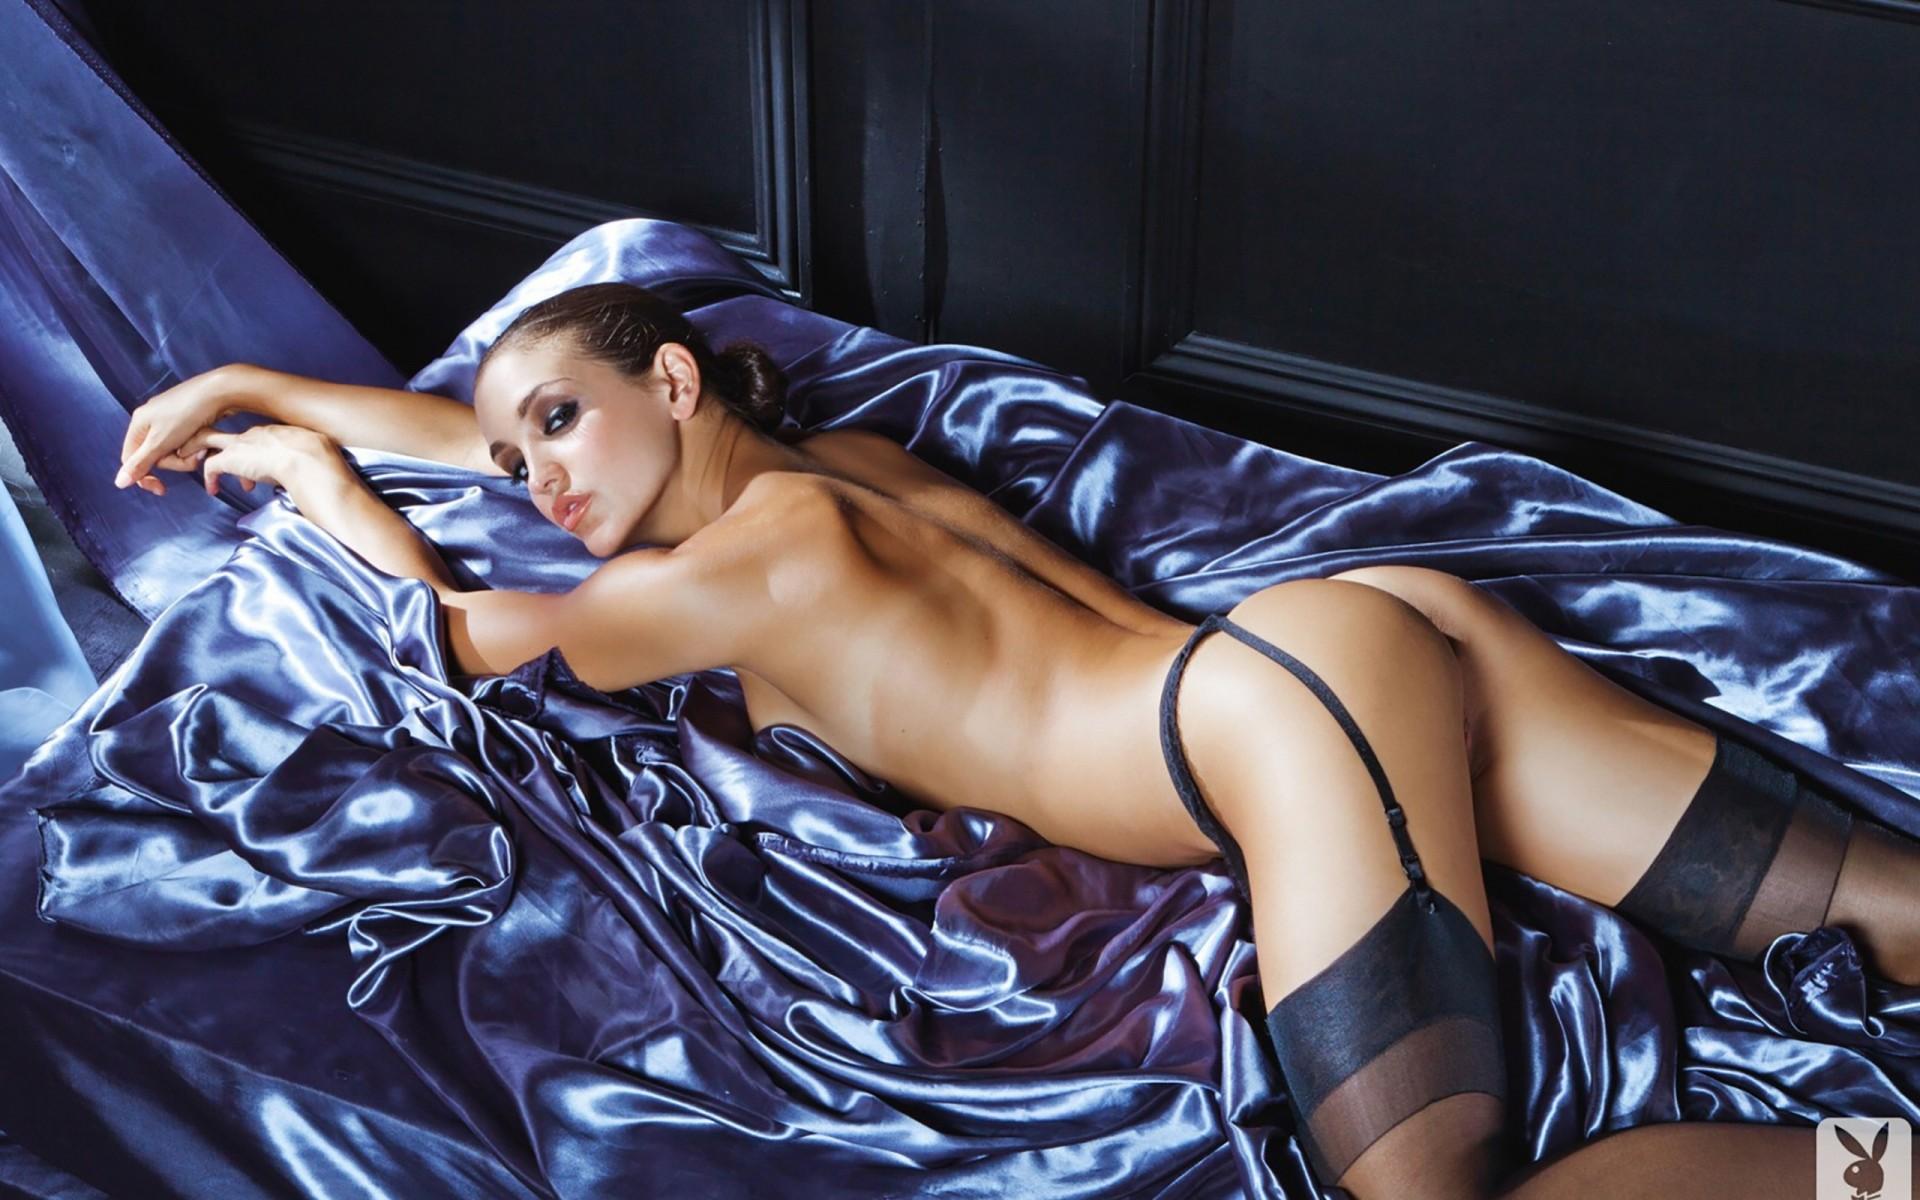 kruglie-seksualnie-video-s-eroticheskih-fotosessiy-modeley